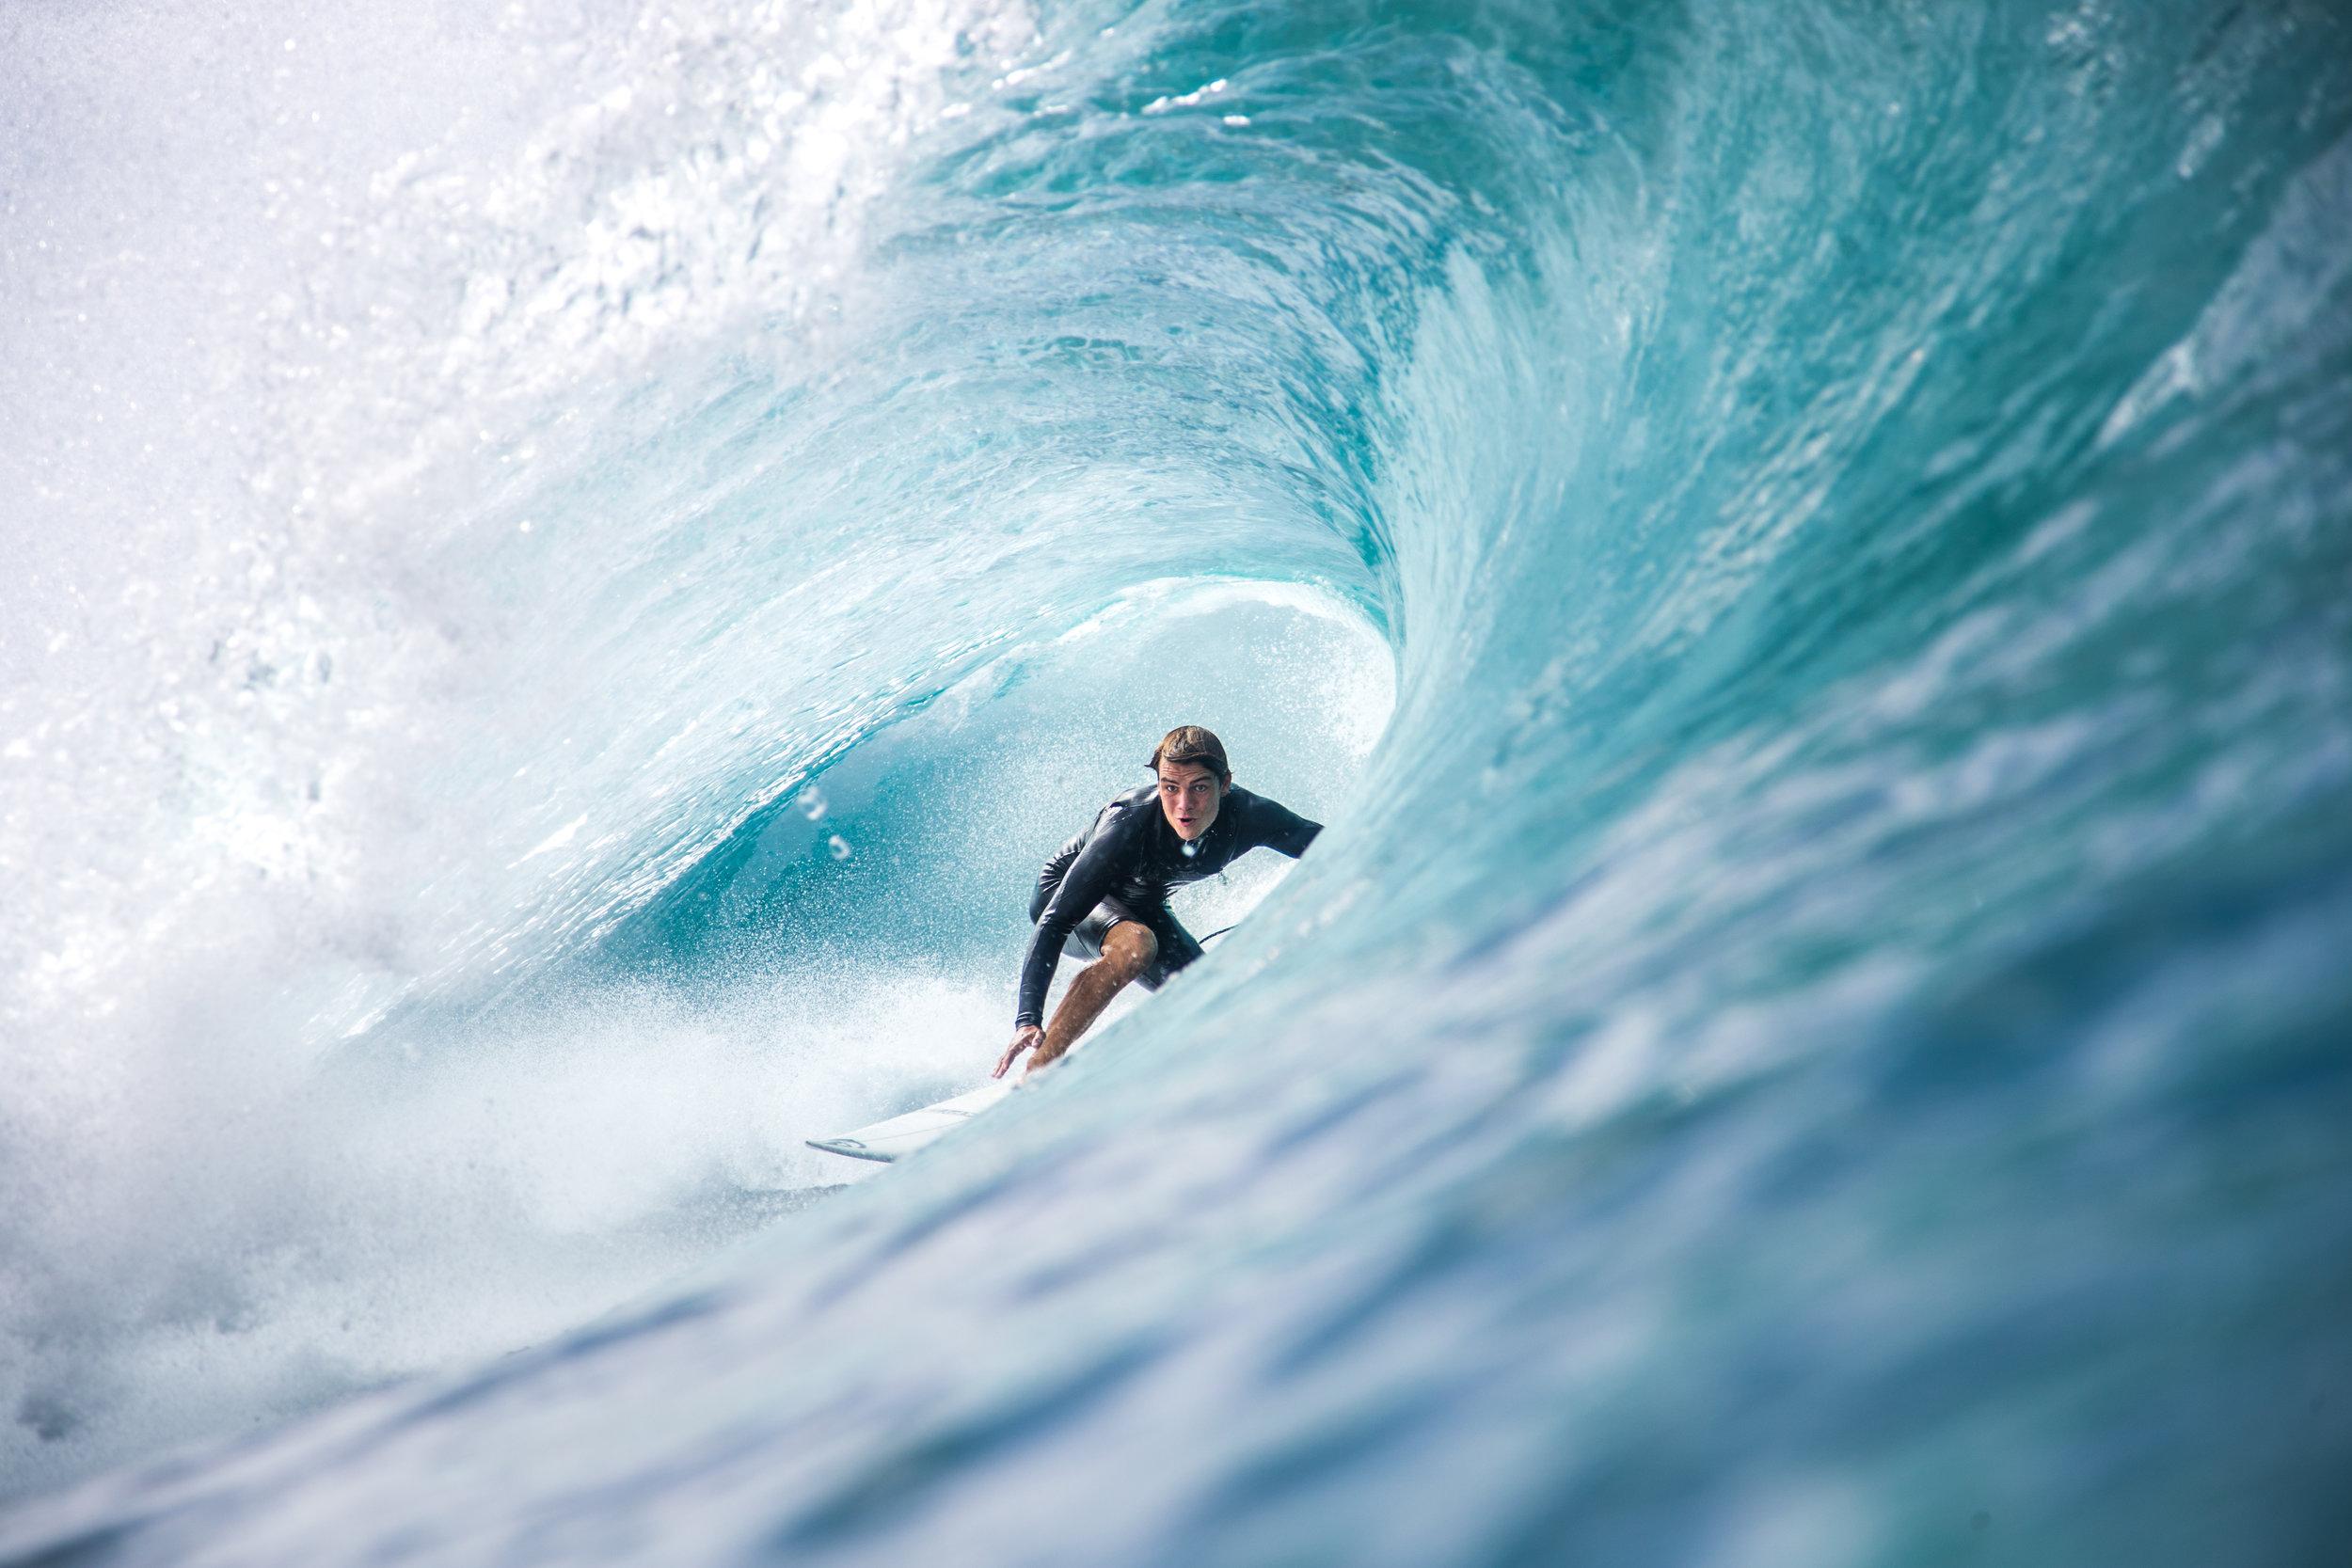 surfing pipeline water photo